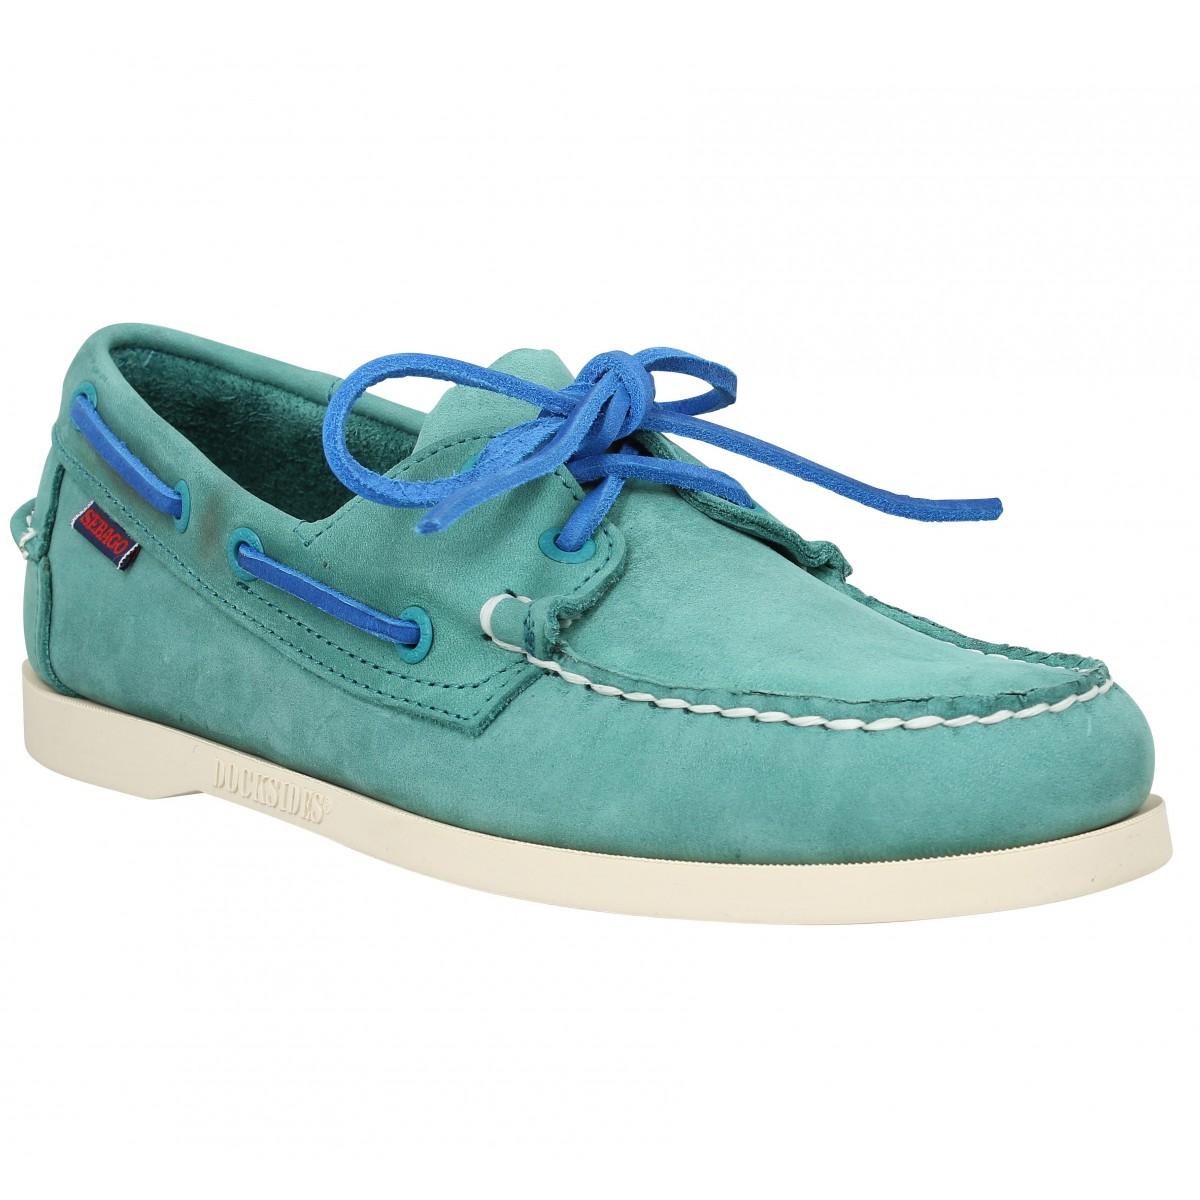 Chaussures bateaux SEBAGO Docksides velours Teal